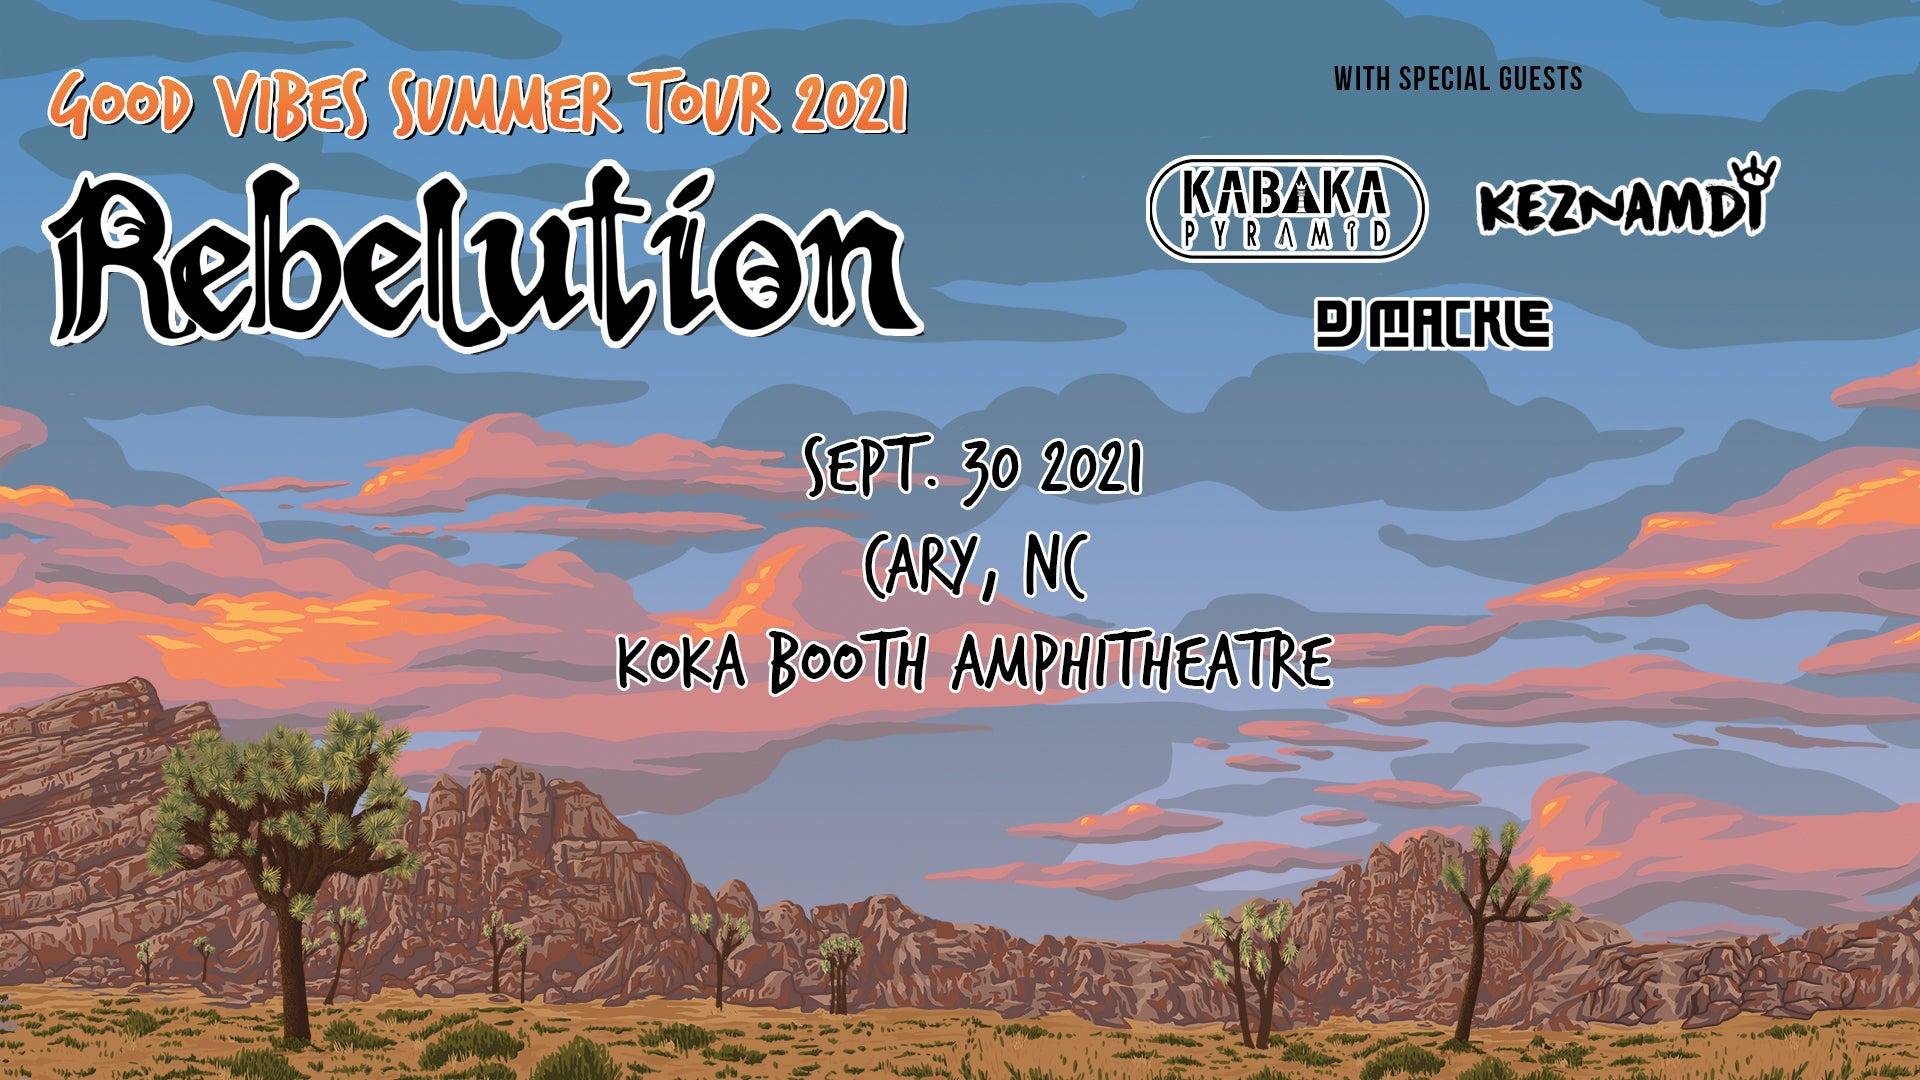 Good Vibes Summer Tour 2021: Rebelution + Special Guests: Kabaka Pyramid, Keznamdi, & DJ Mackle